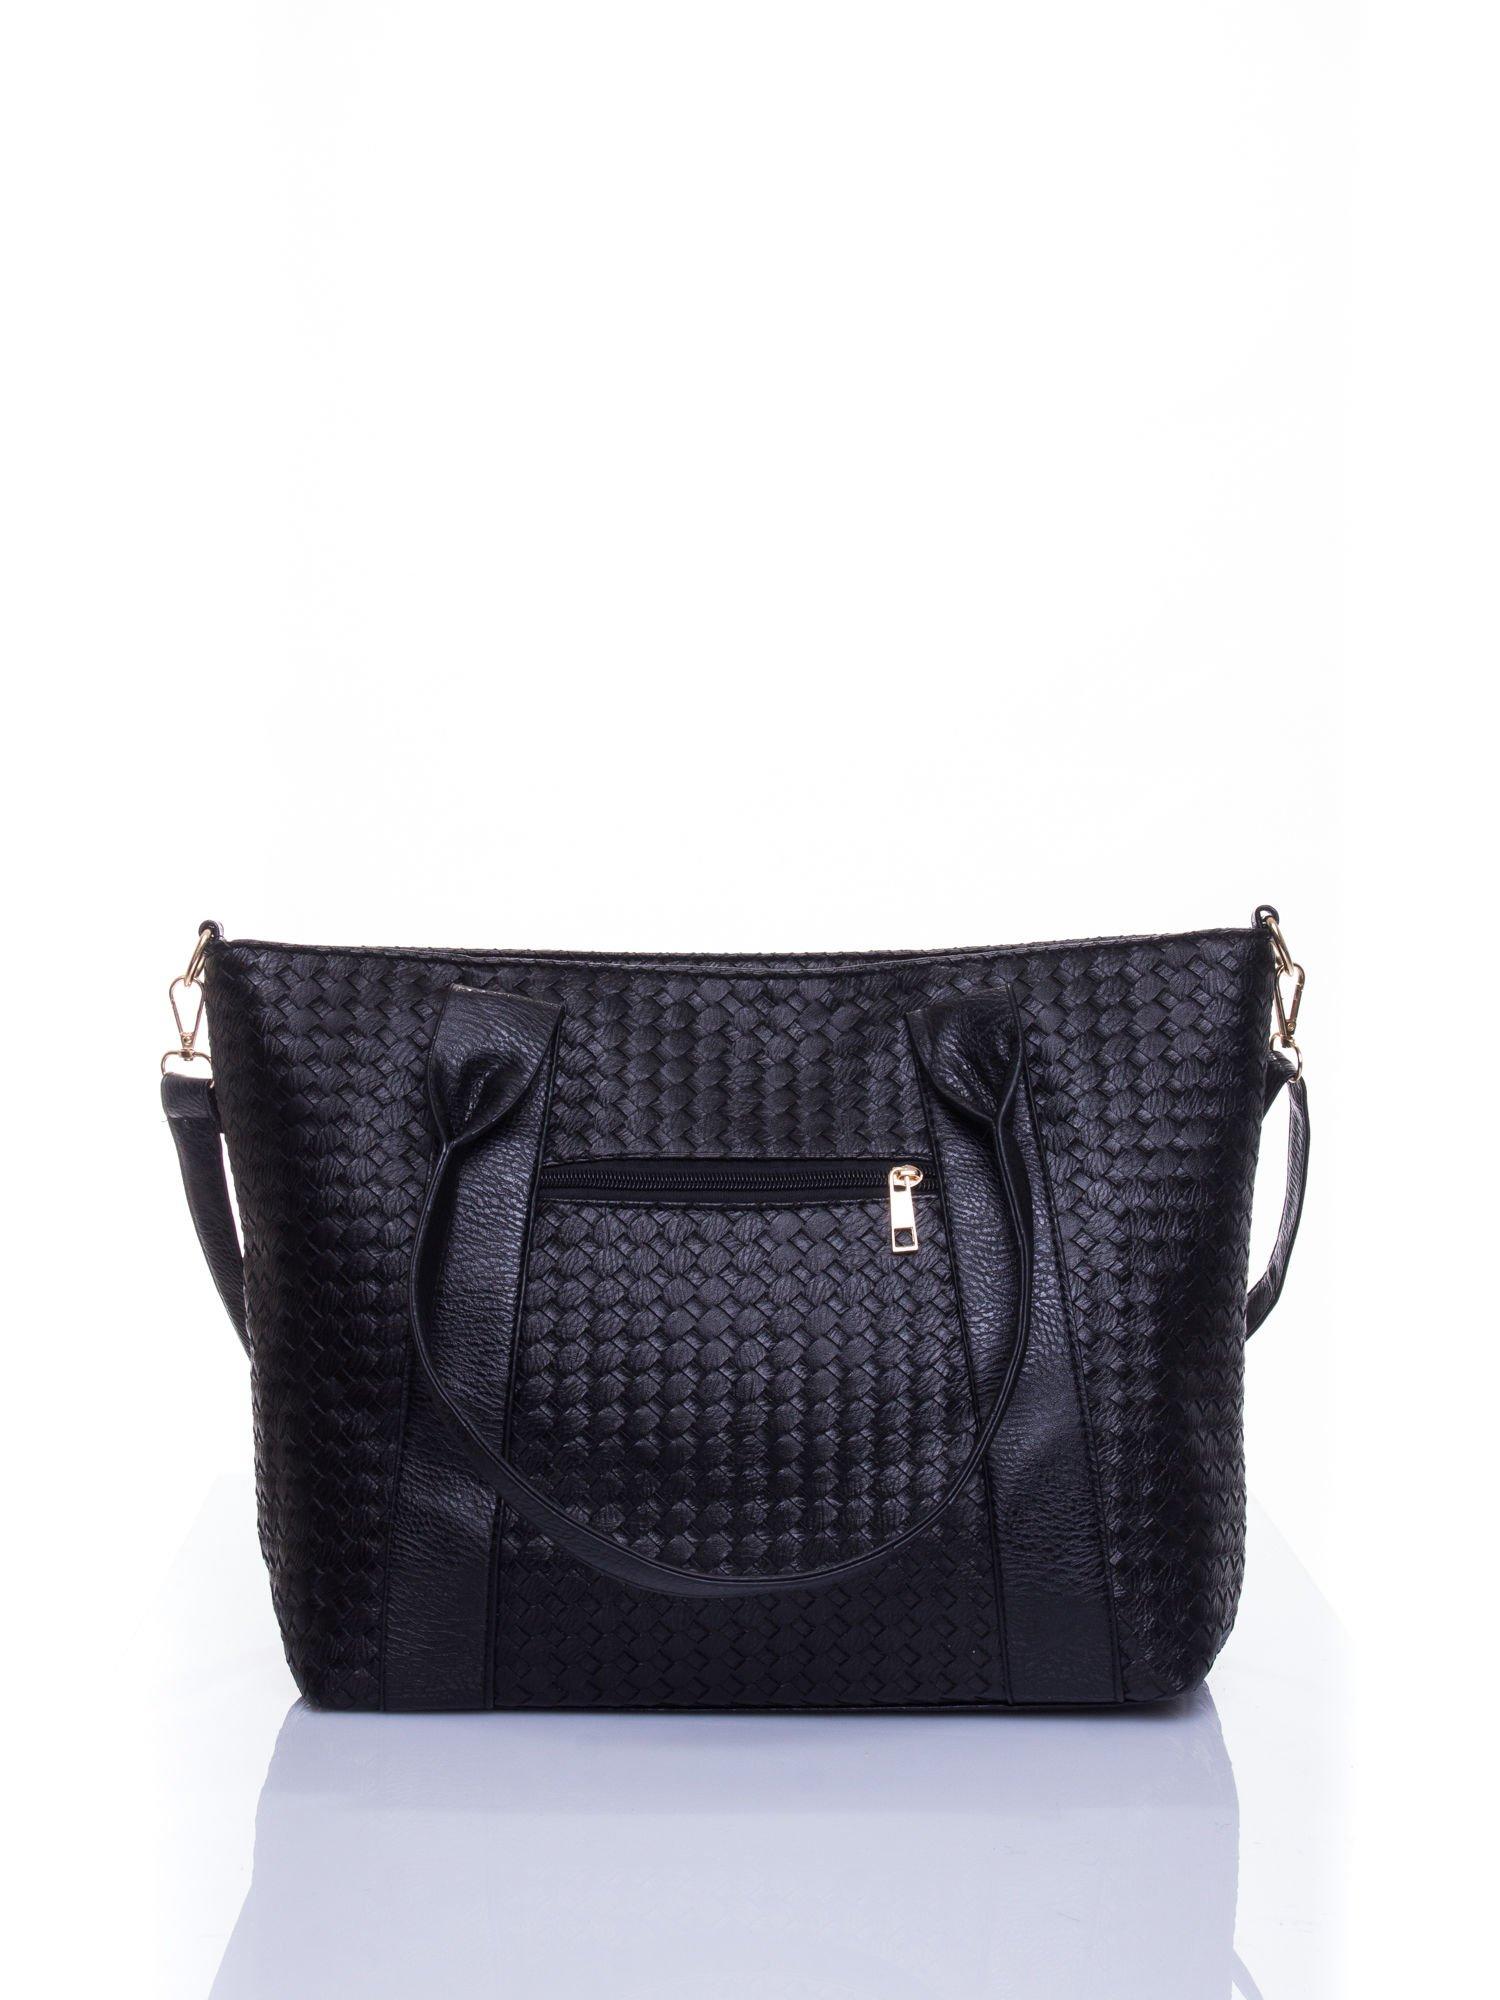 Czarna pleciona torebka z suwakami                                  zdj.                                  3